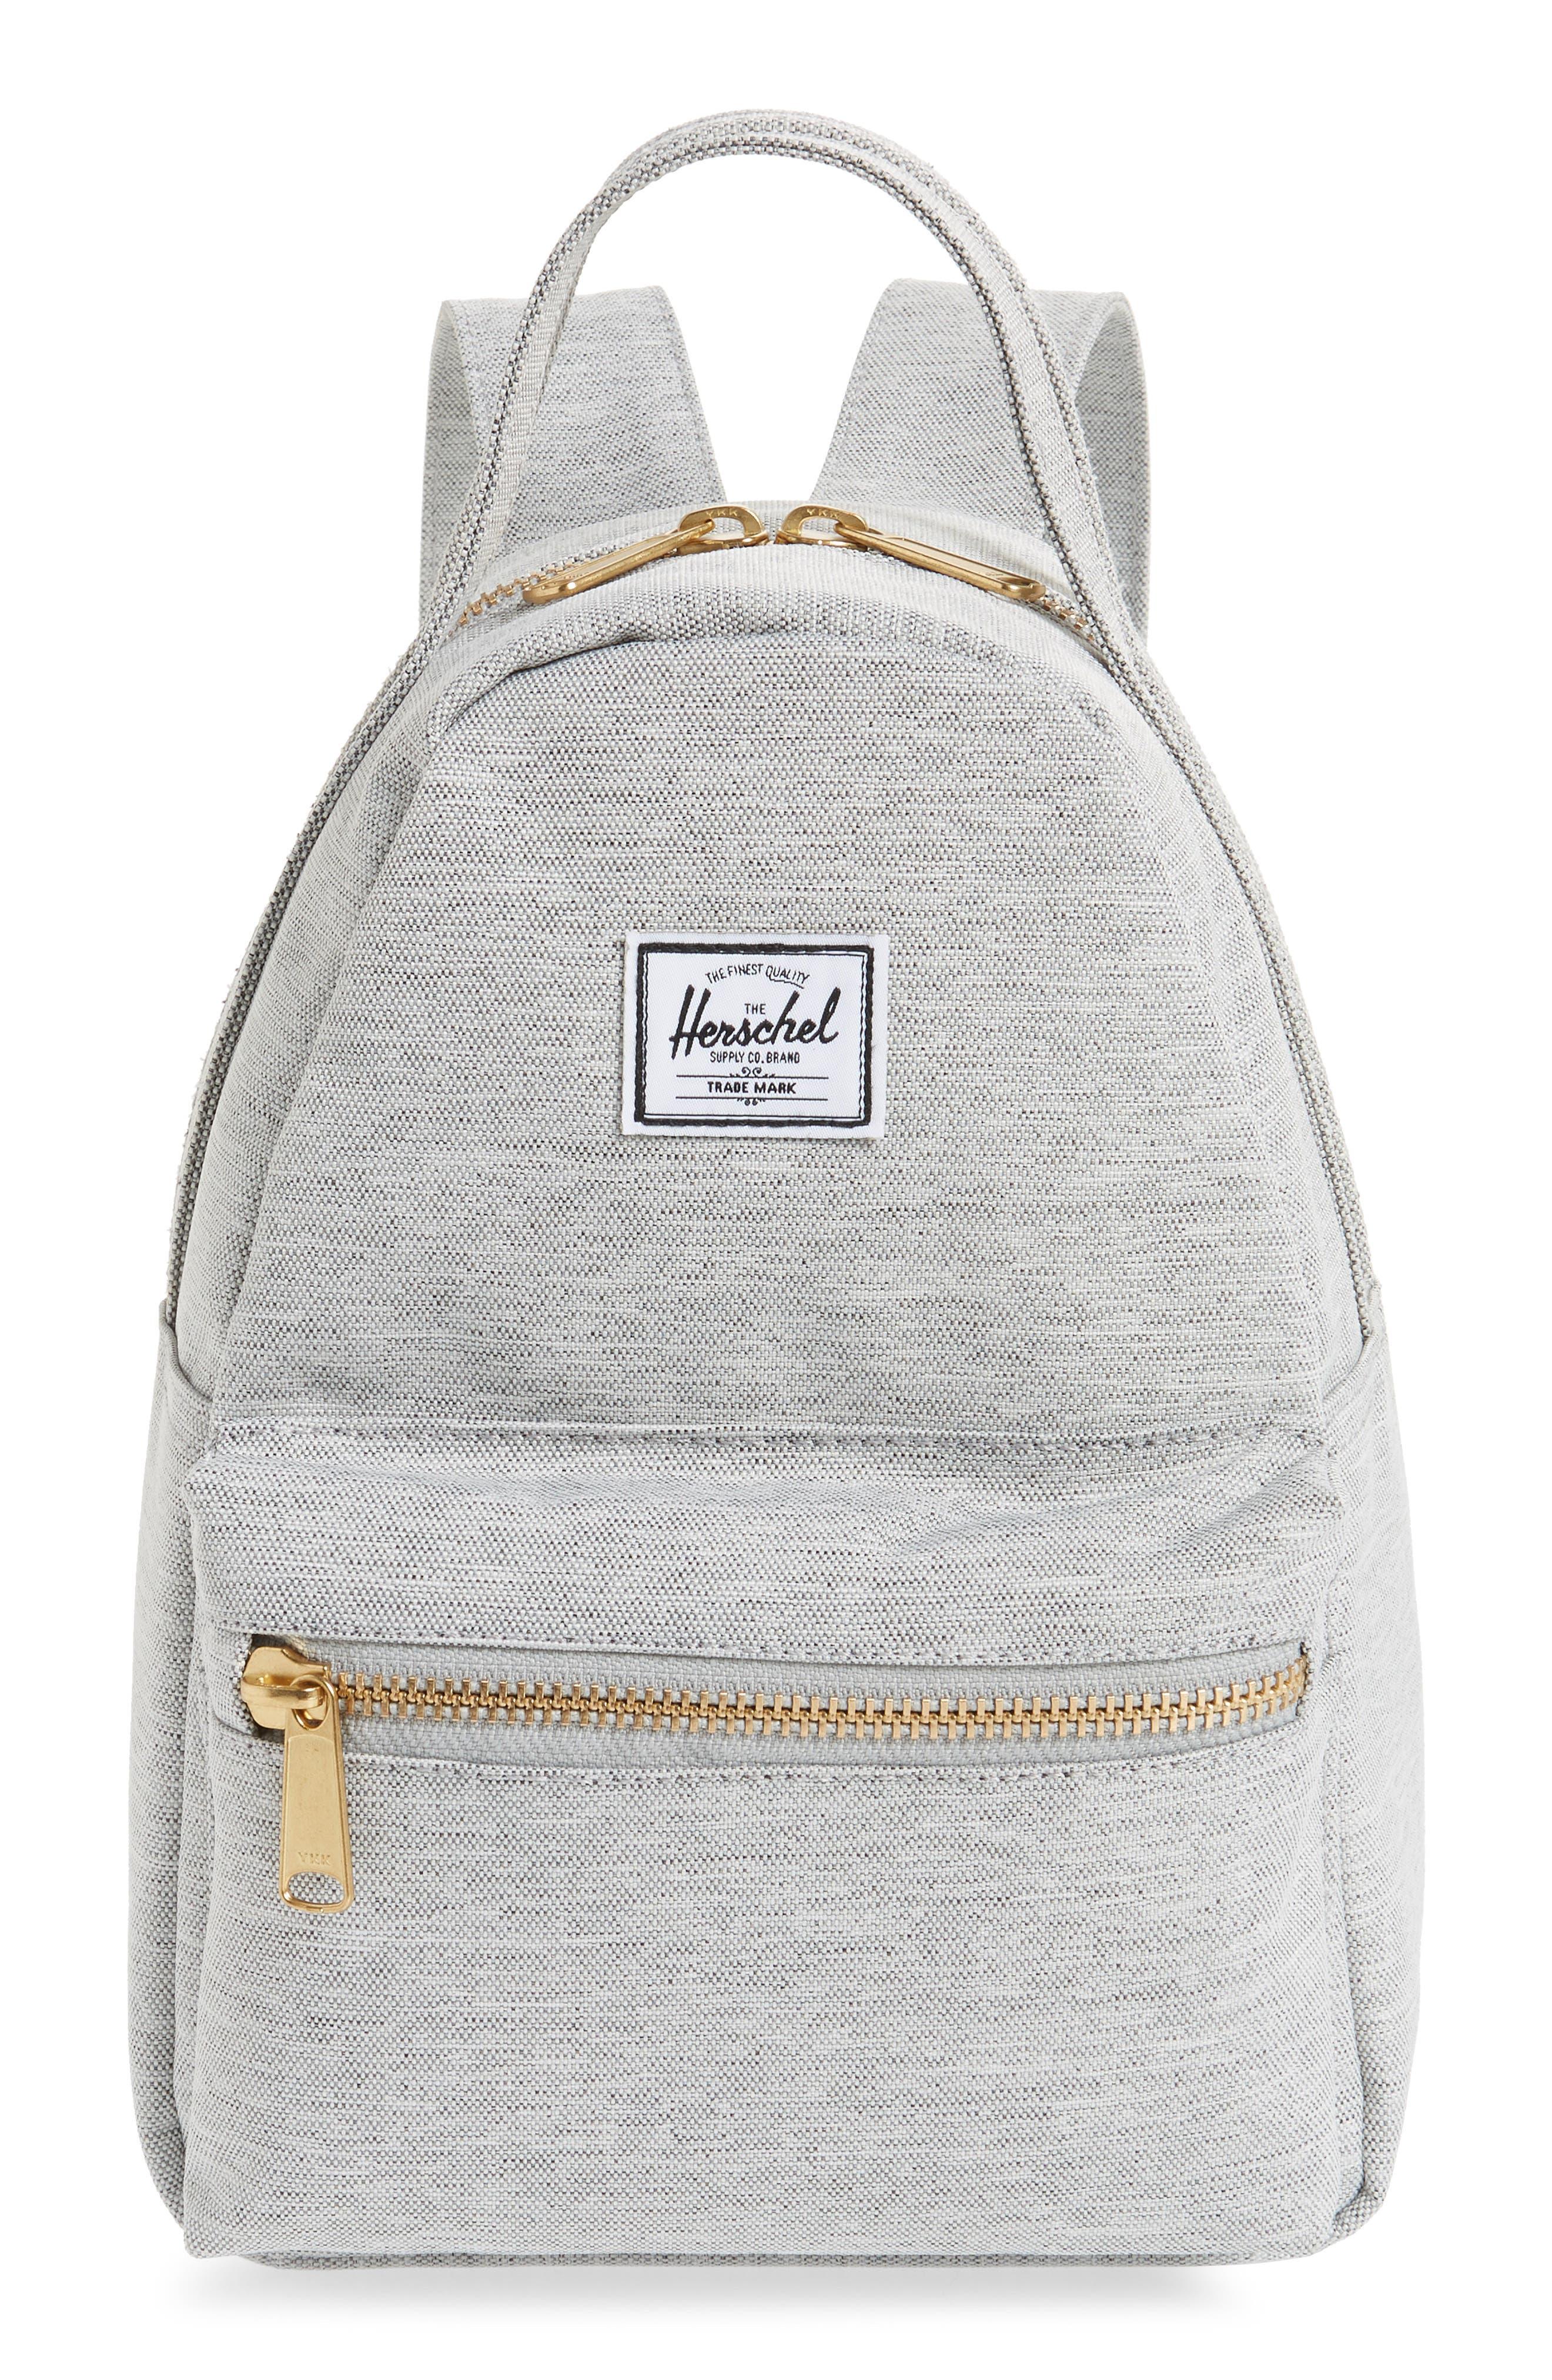 Mini Nova Backpack,                         Main,                         color, LIGHT GREY CROSSHATCH